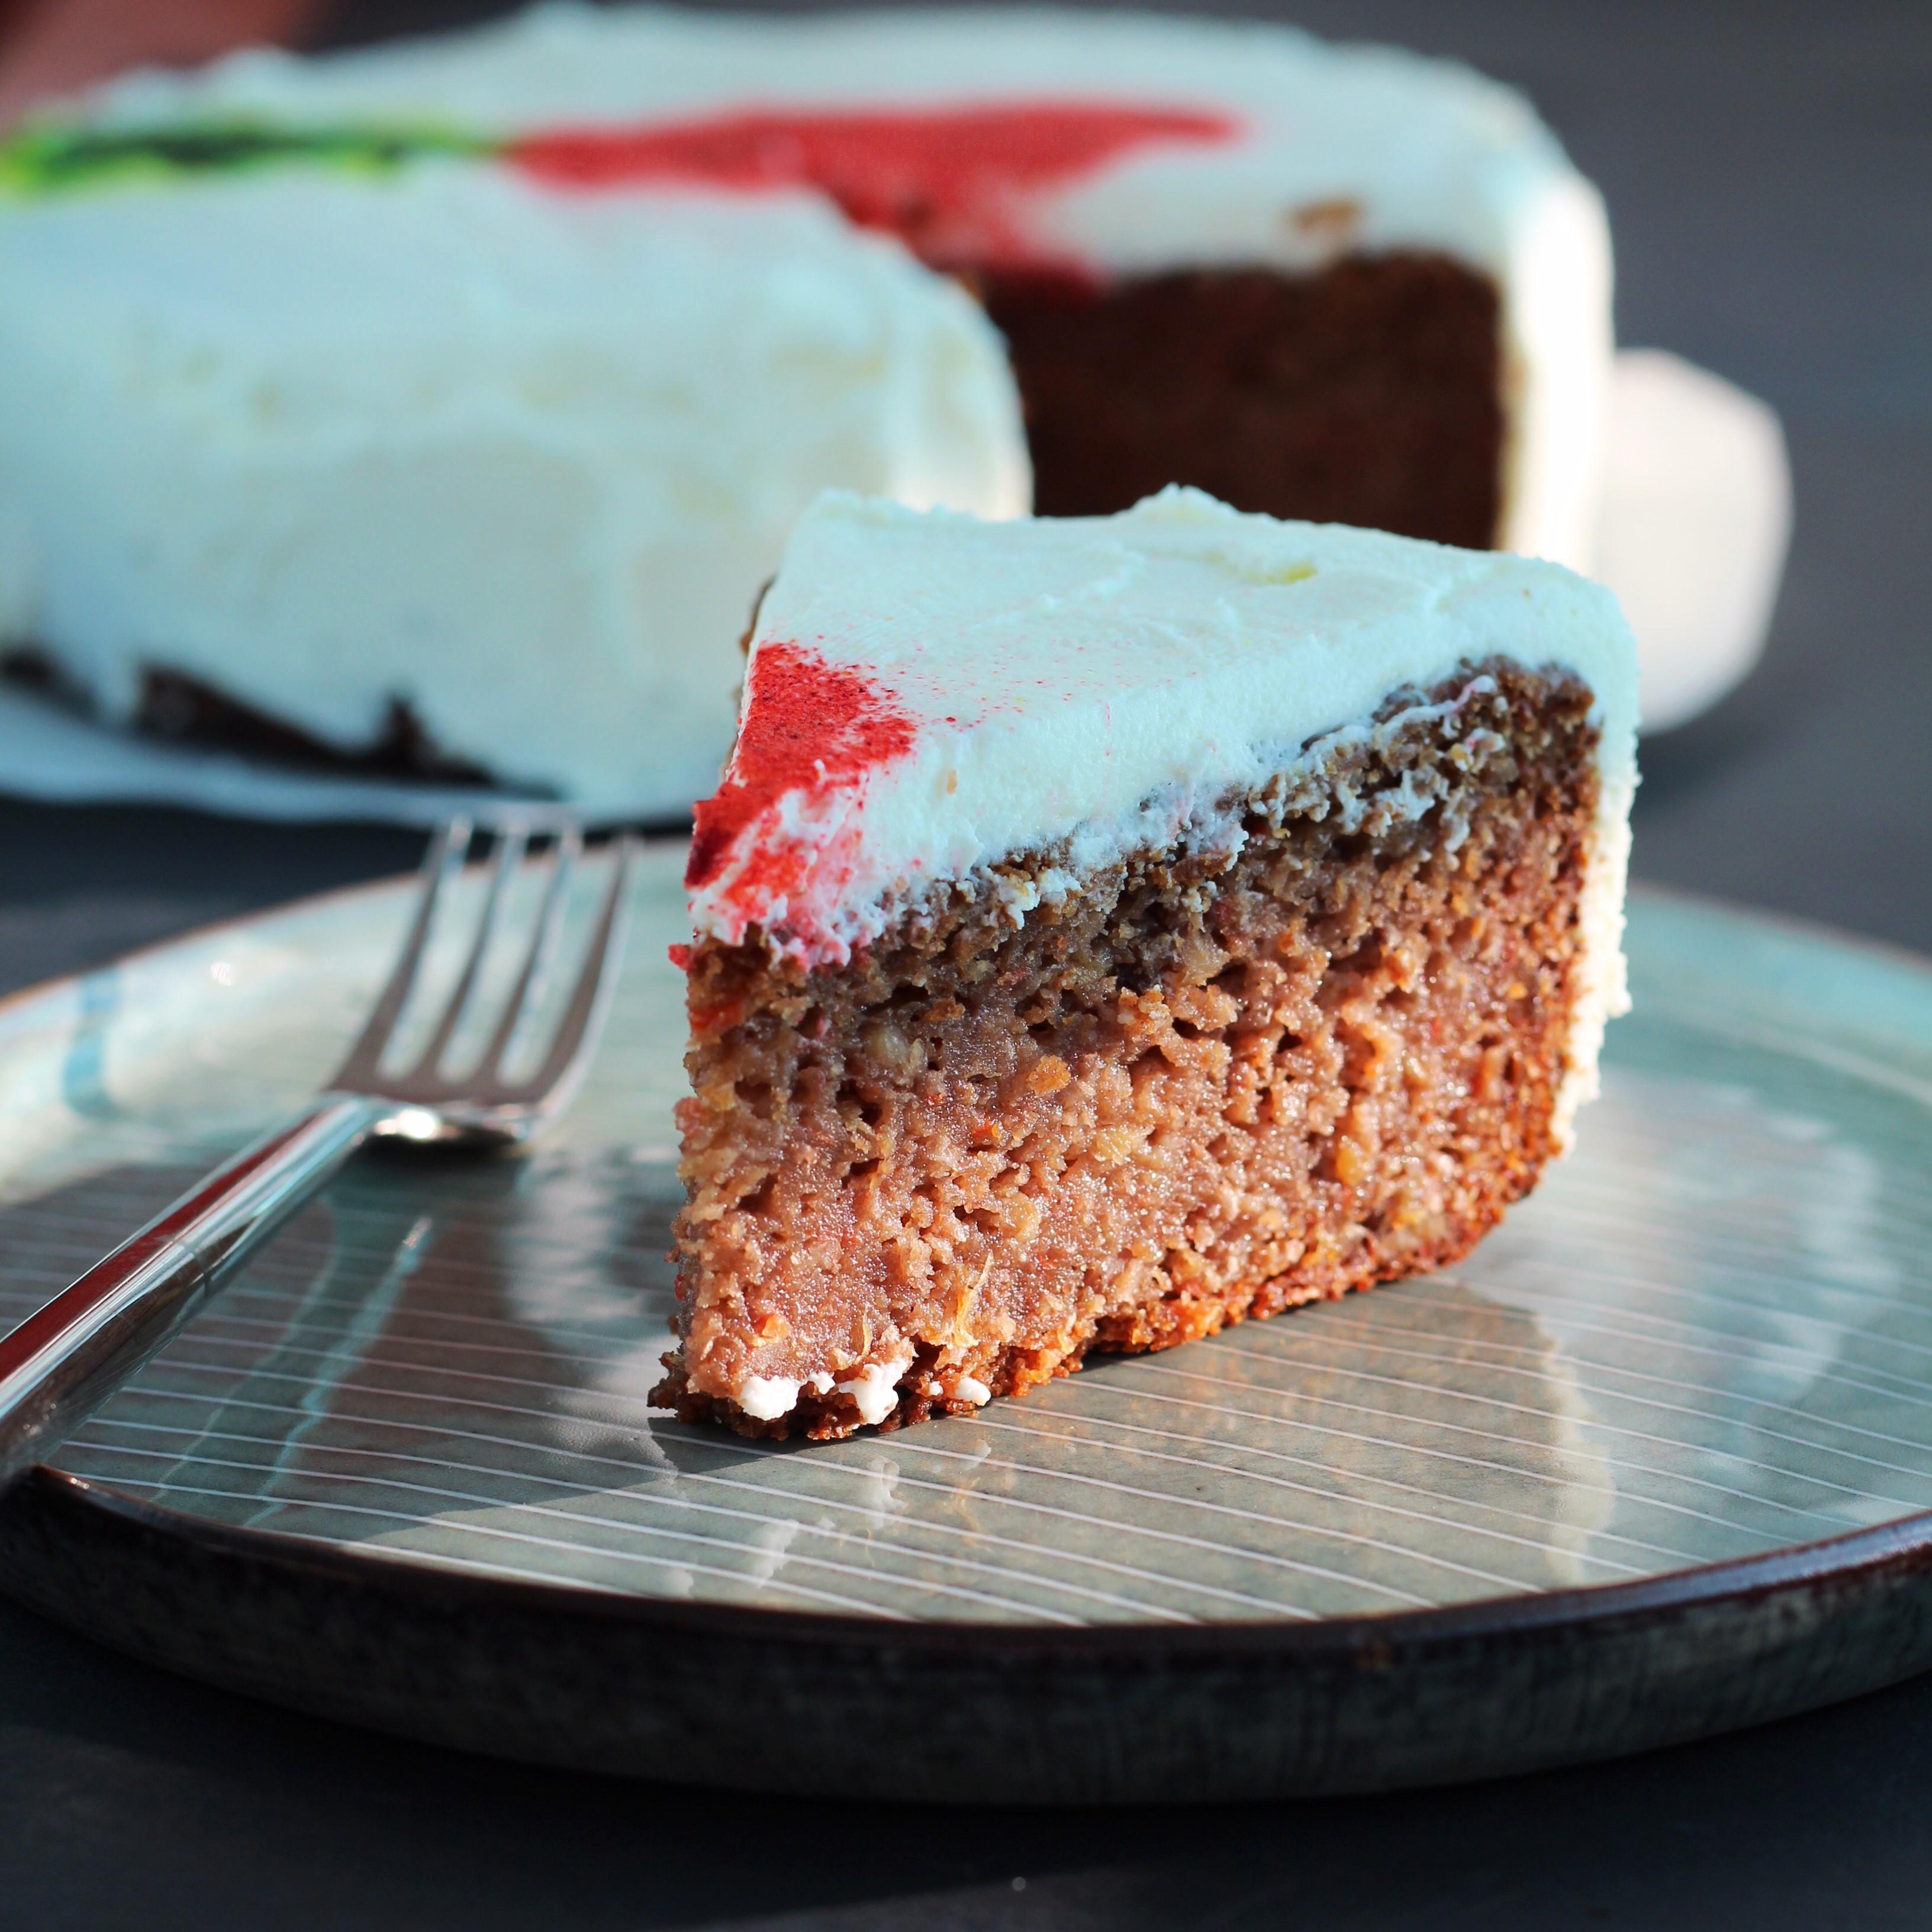 Gluten-Free Vegan Carrot Cake shadelta